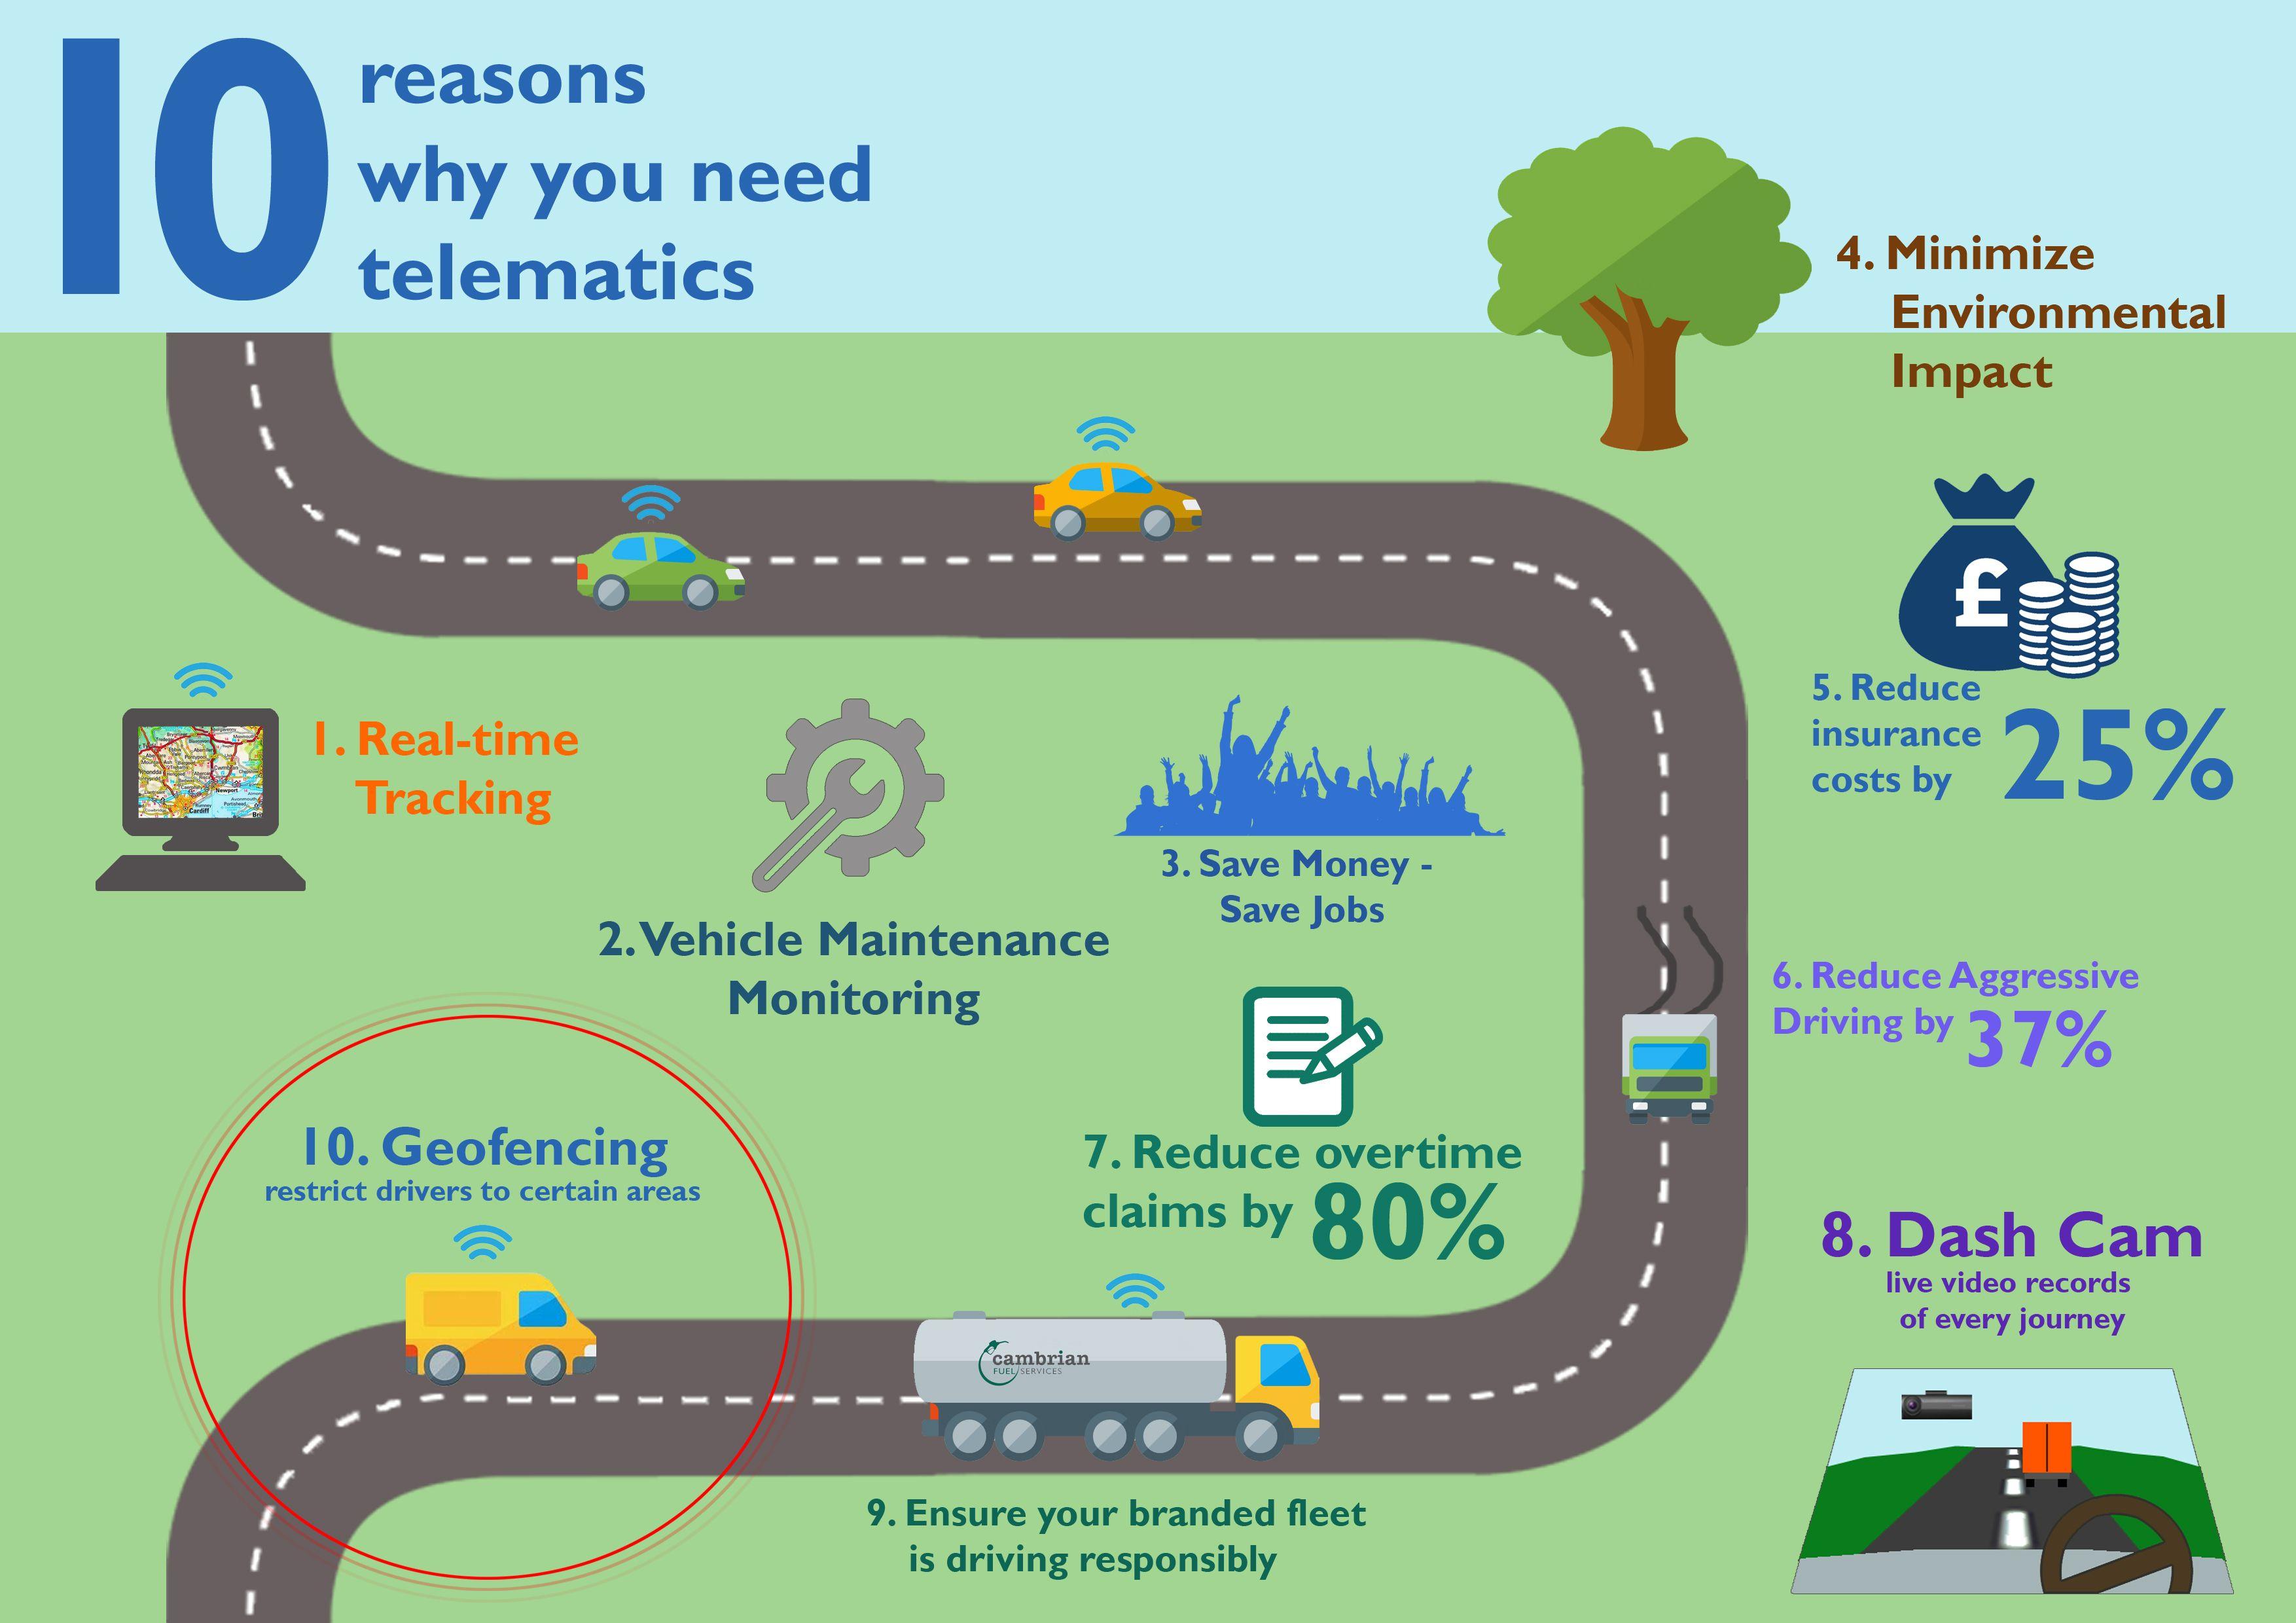 10 Reasons Why You Need Telematics 10 Things Smart Car 10 Reasons